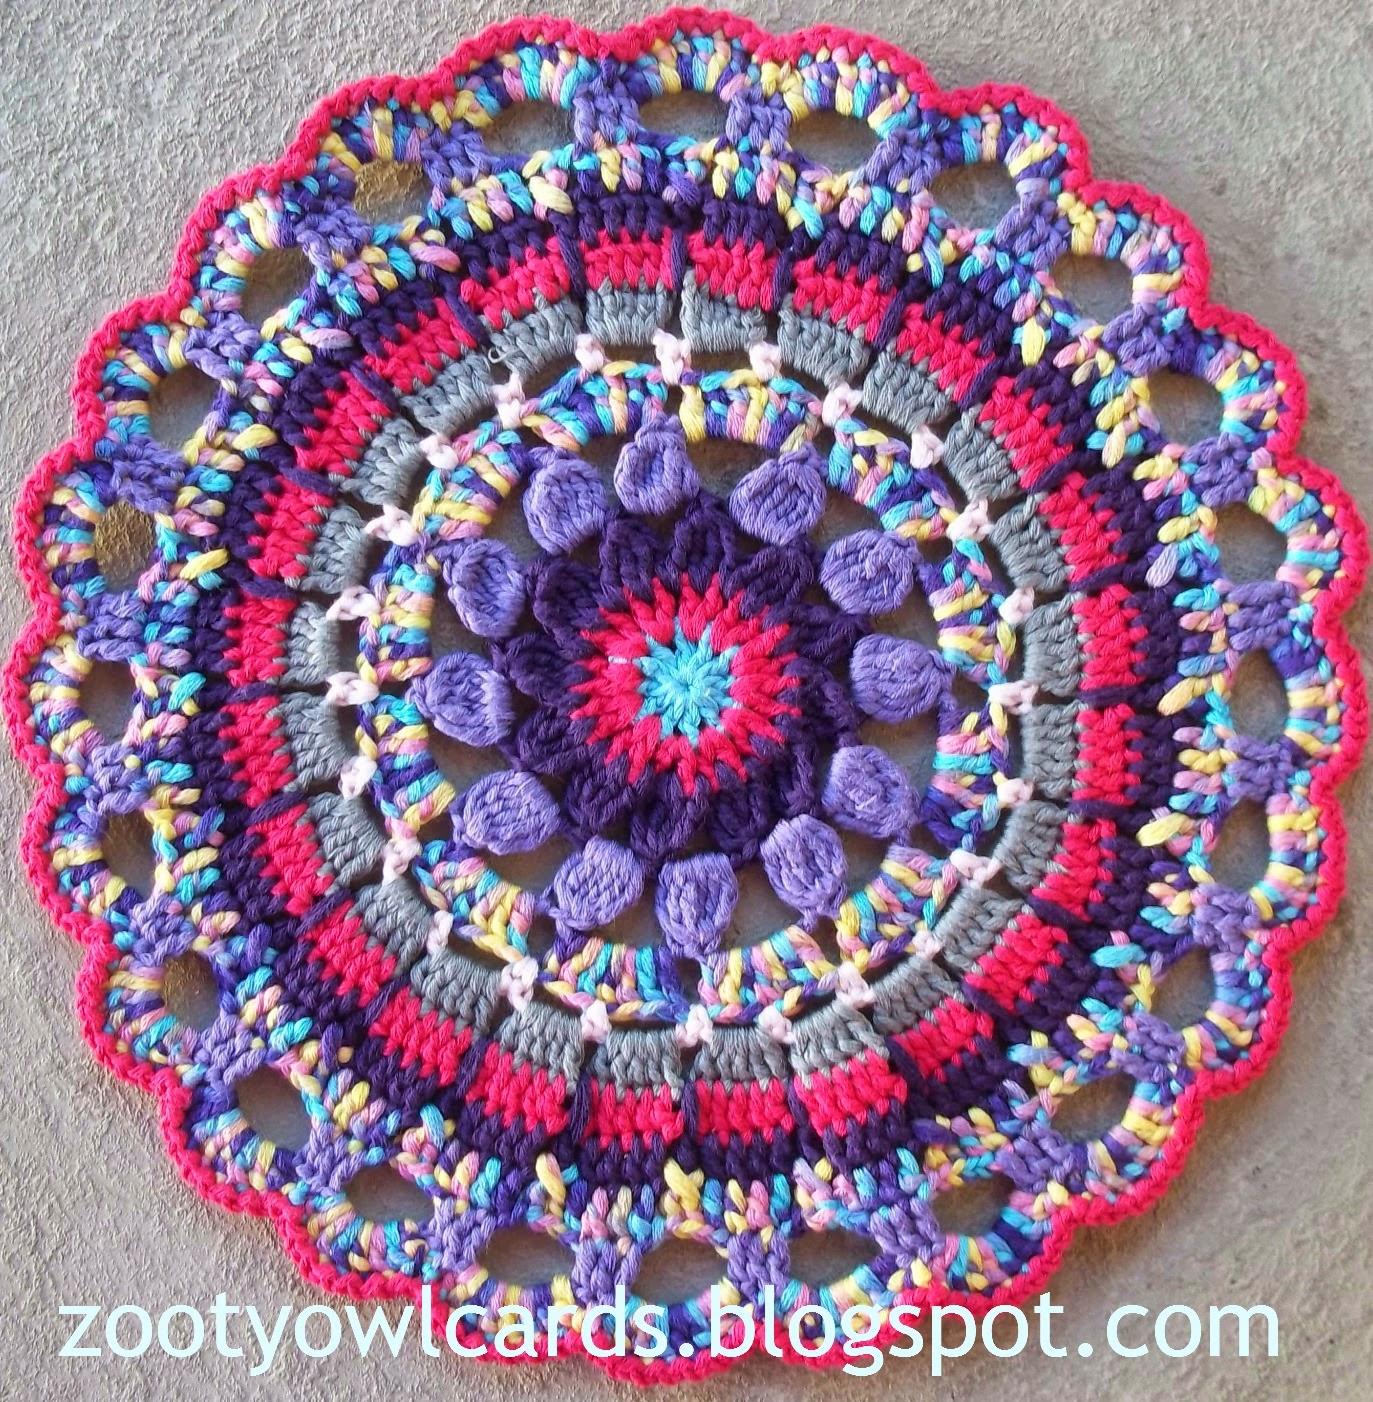 Crochet Patterns For Mandala Yarn : Zooty Owls Crafty Blog: Dahlia Mandala: Pattern